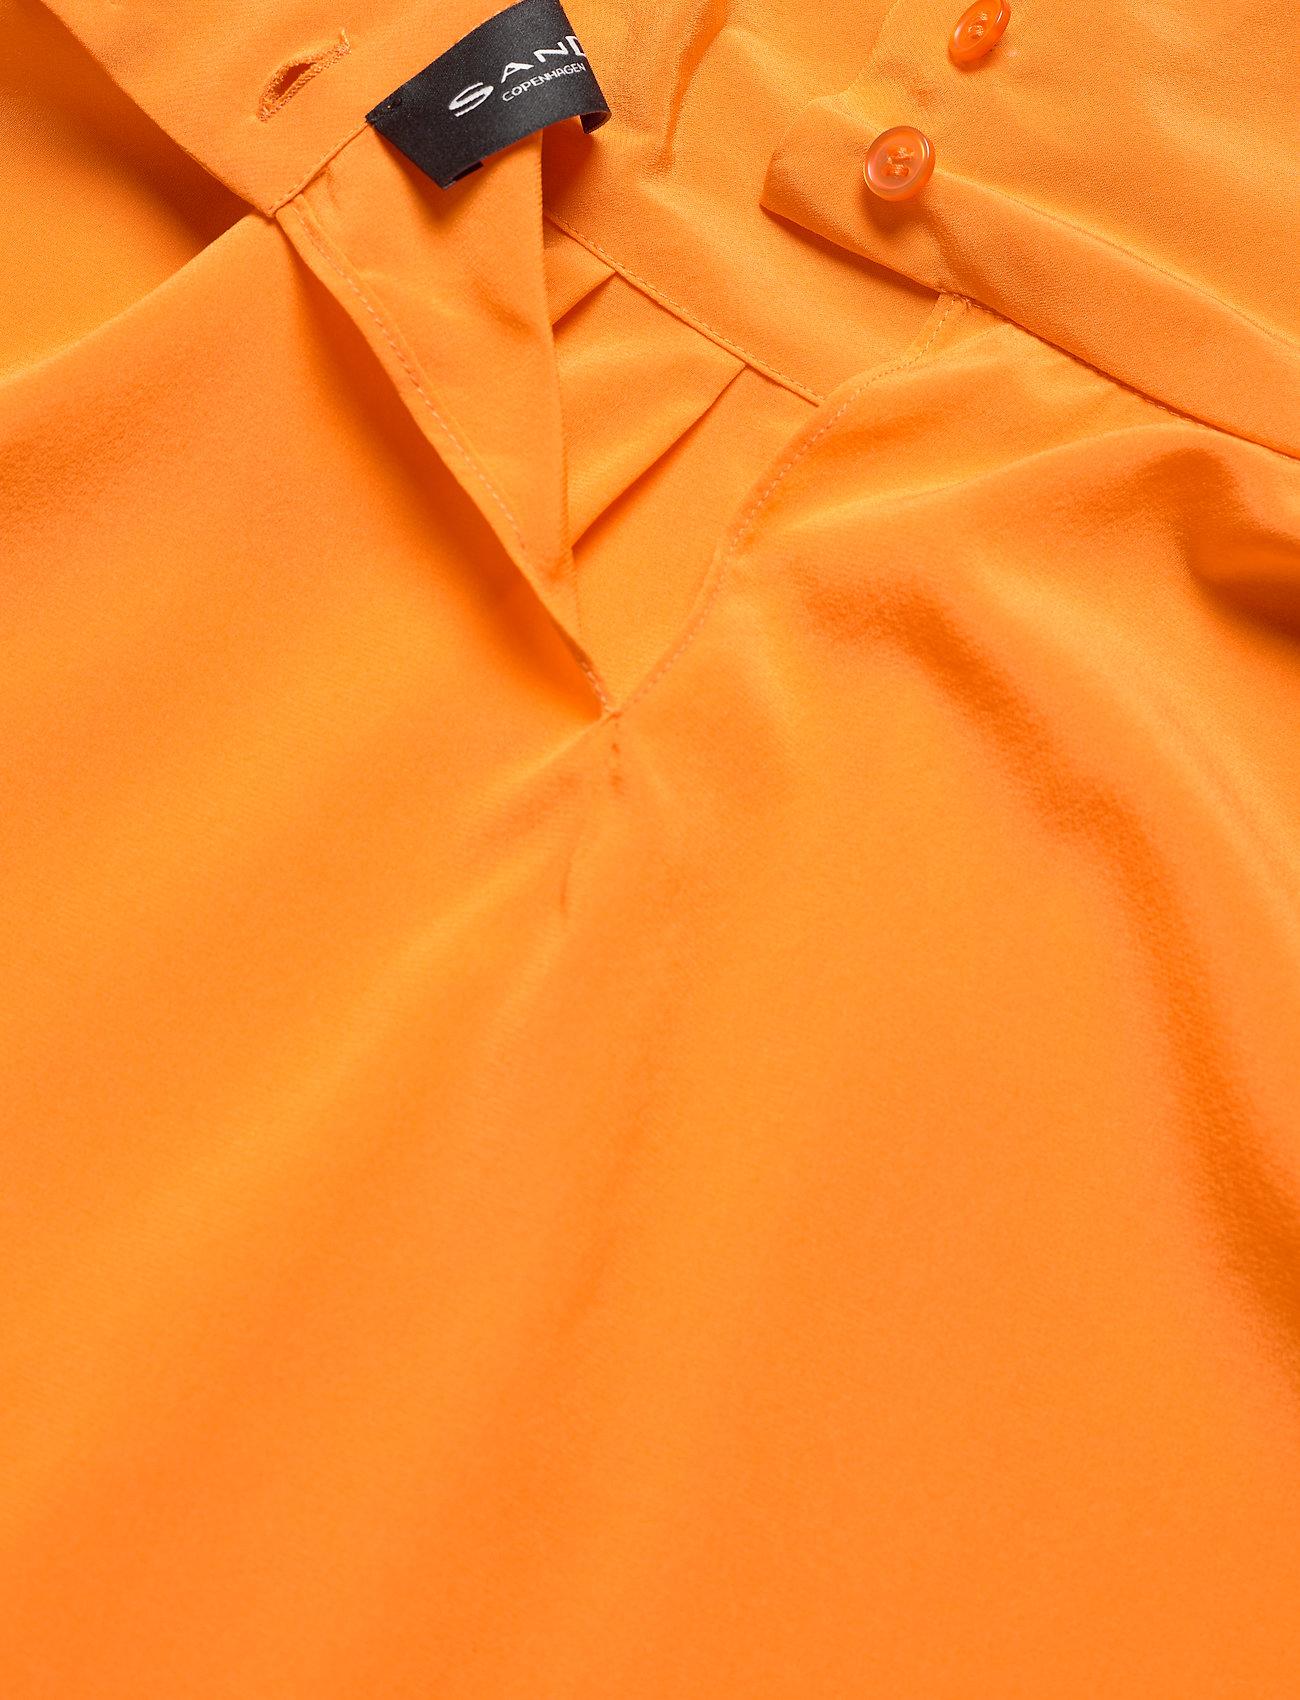 SAND CDC Stretch - Prosa Top - Bluser & Skjorter ORANGE - Dameklær Spesialtilbud